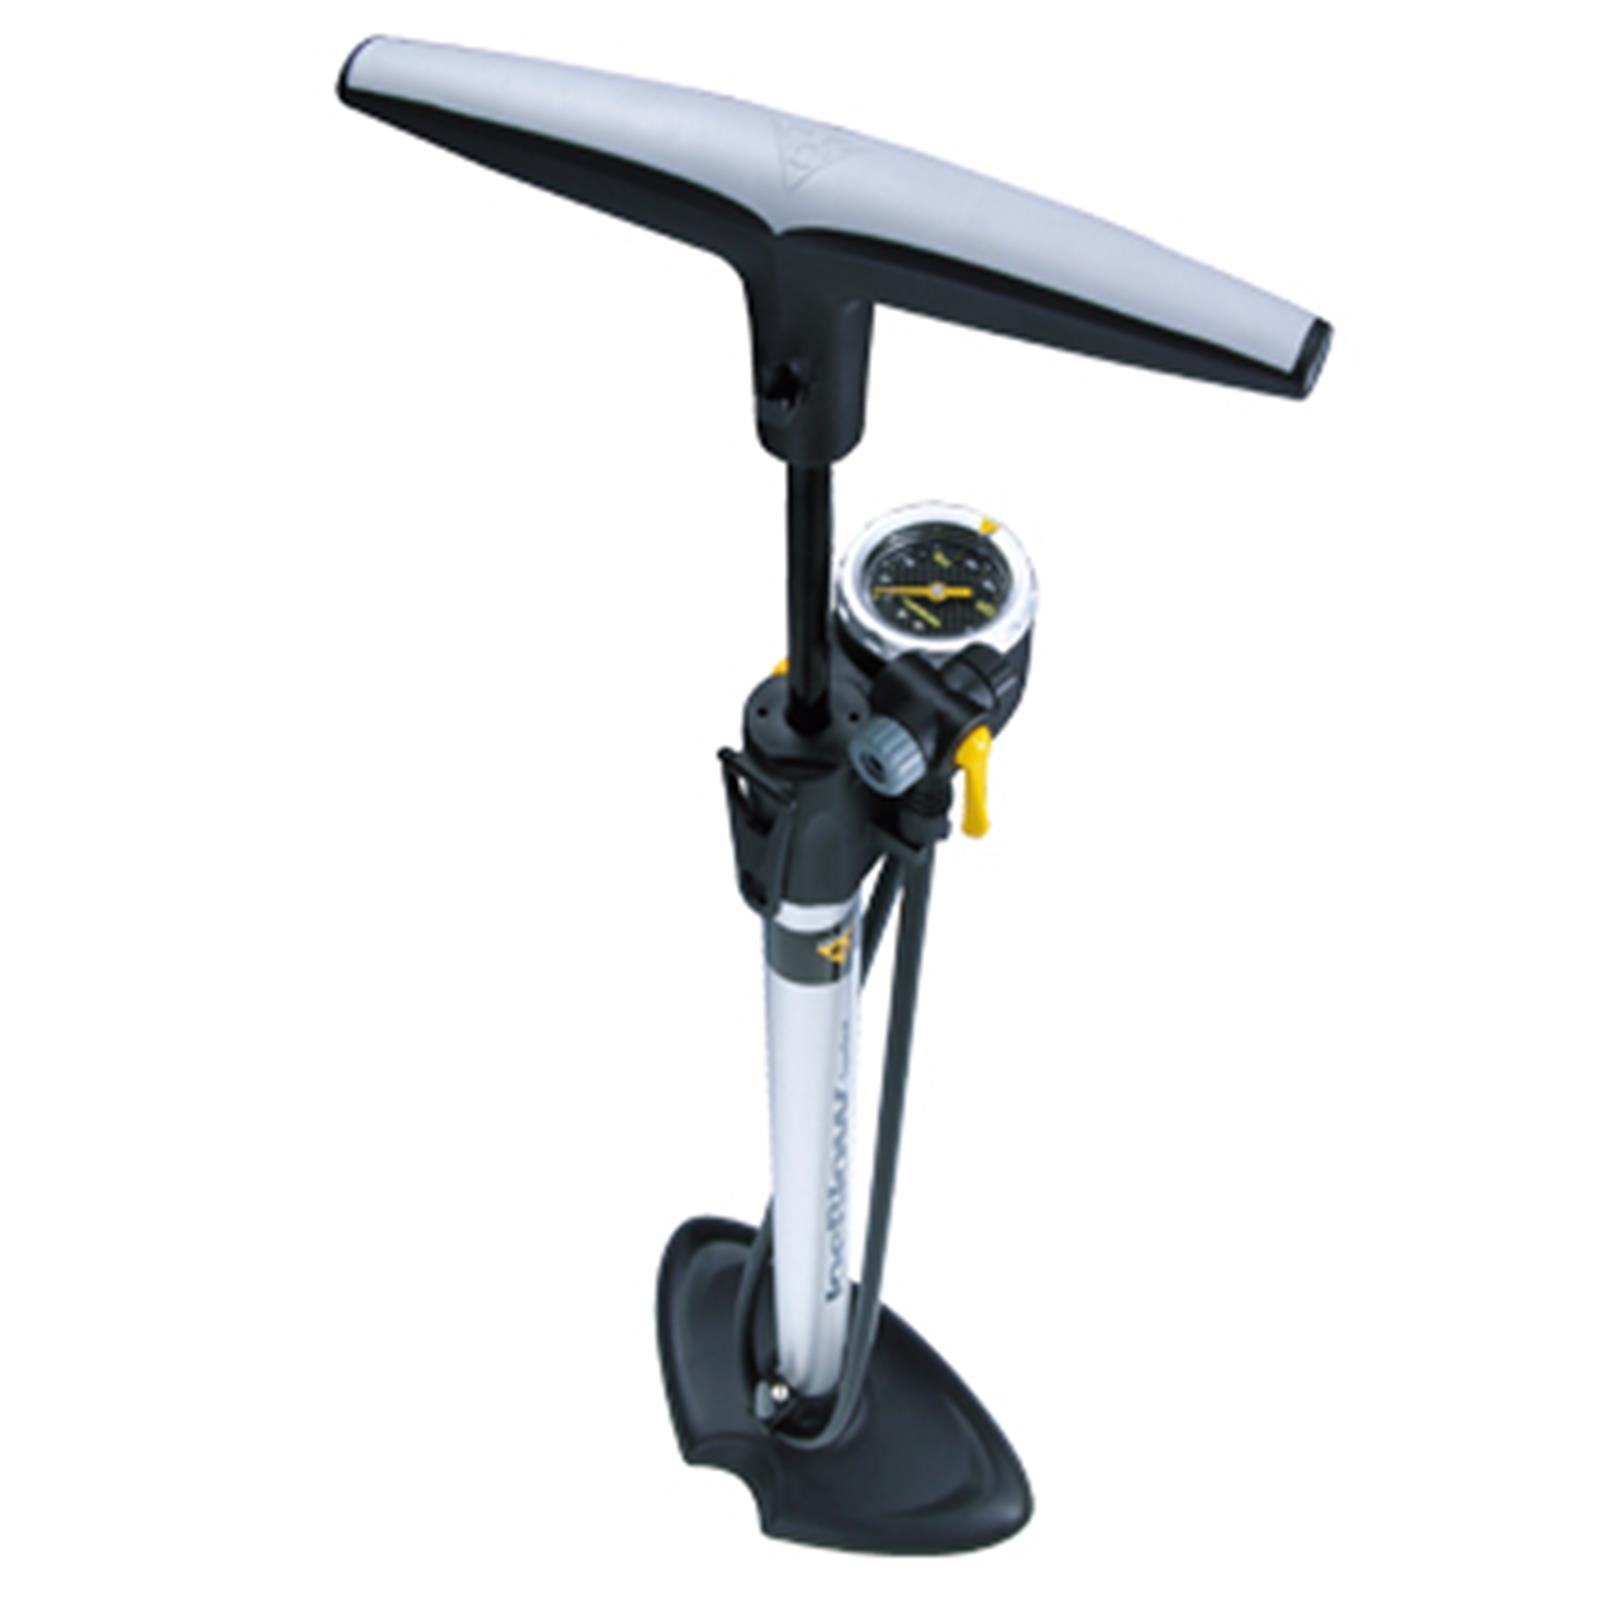 Topeak Joe Blow Sport Standpumpe Rennrad Trekking MTB Fahrrad Luftpumpe Luft